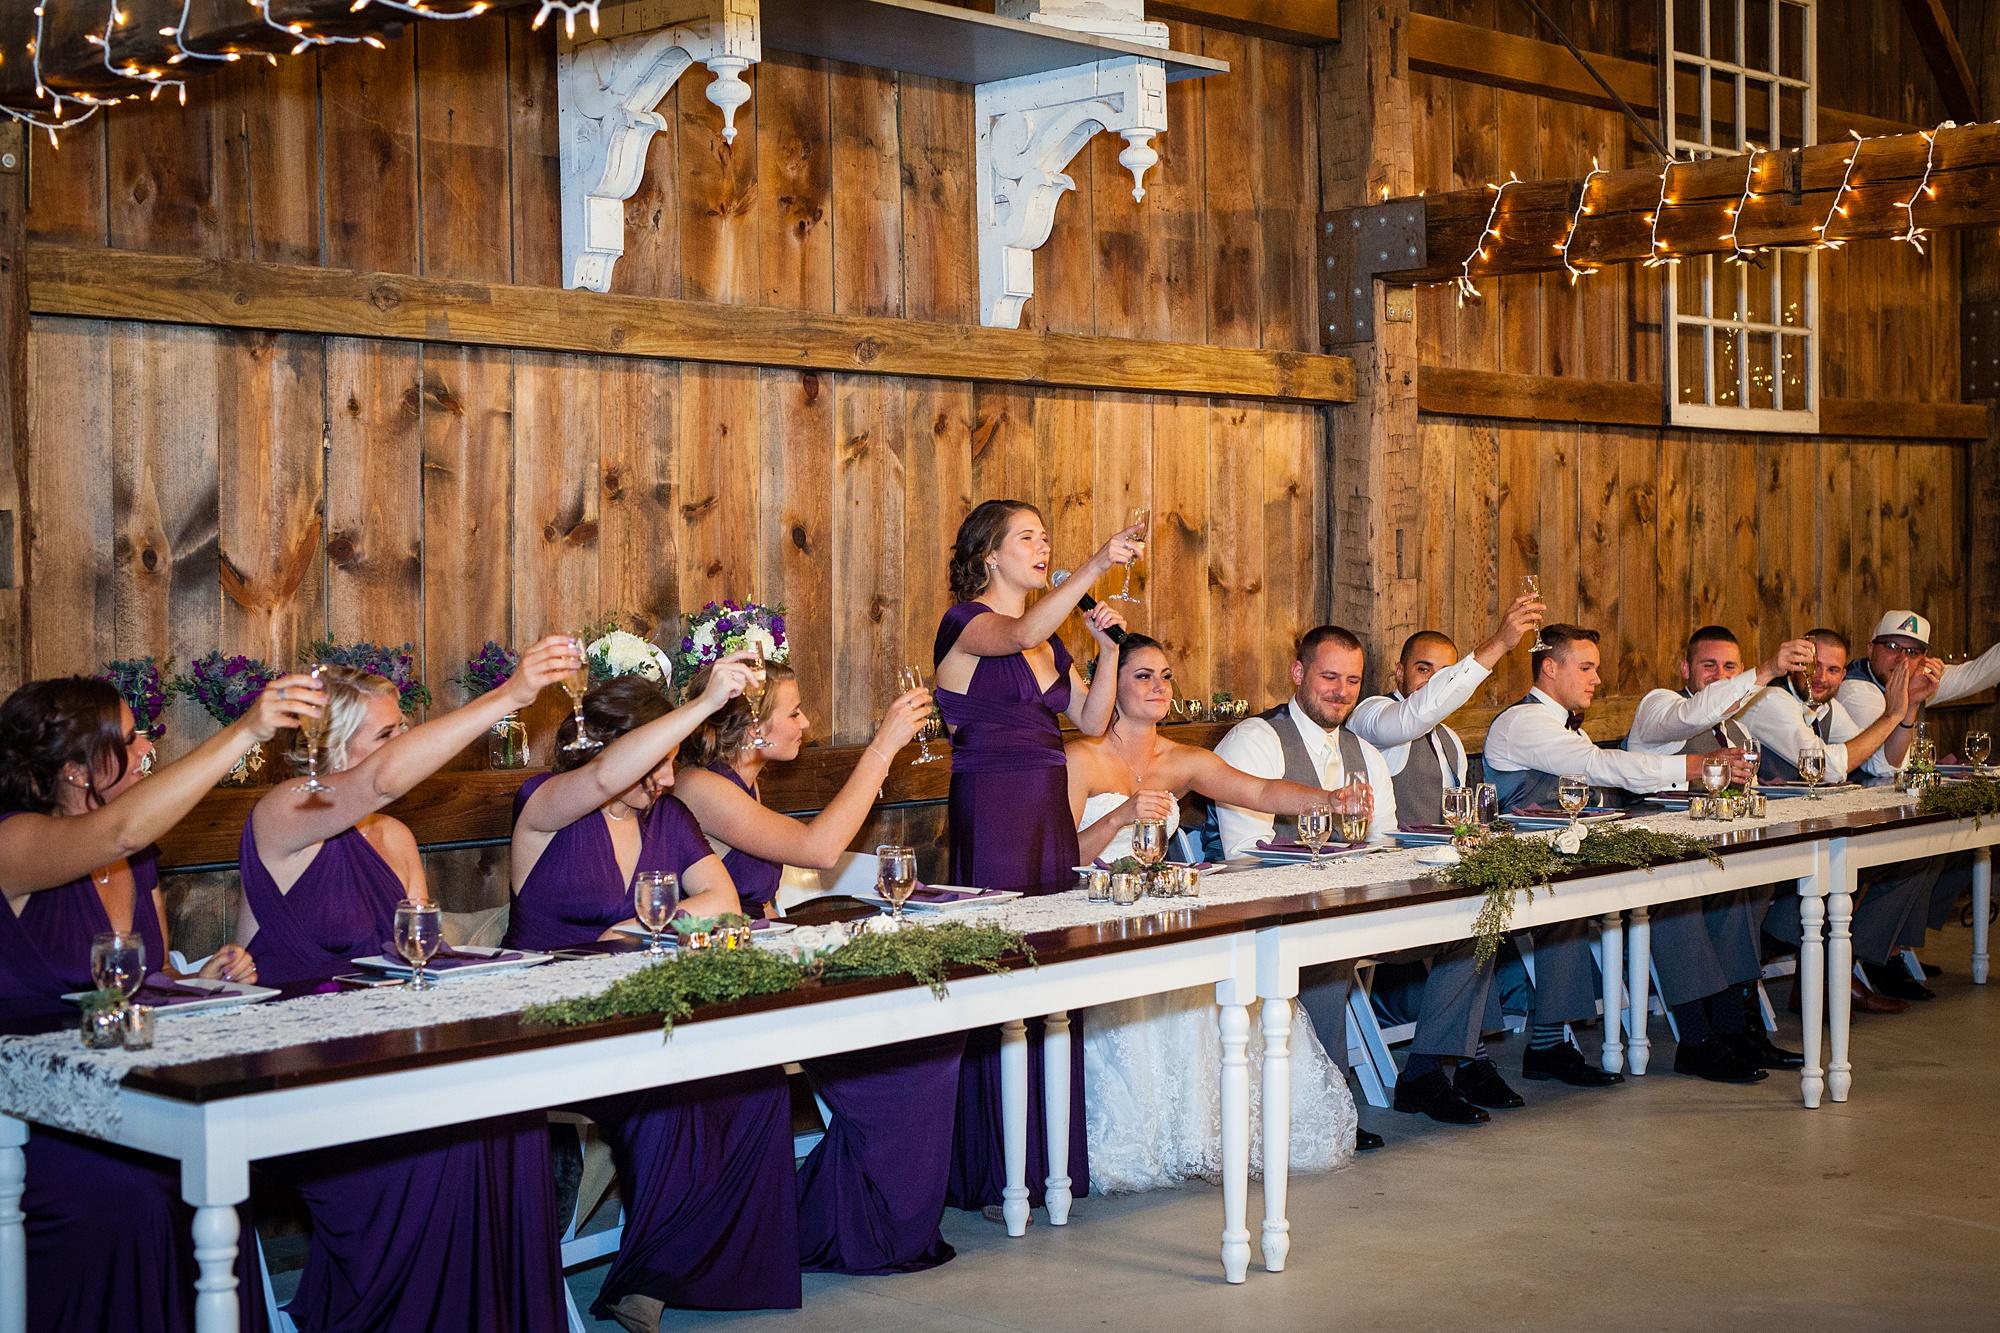 Brandon_Shafer_Photography_Emily_Travis_Kalamazoo_Wedding_Photography_0050.jpg